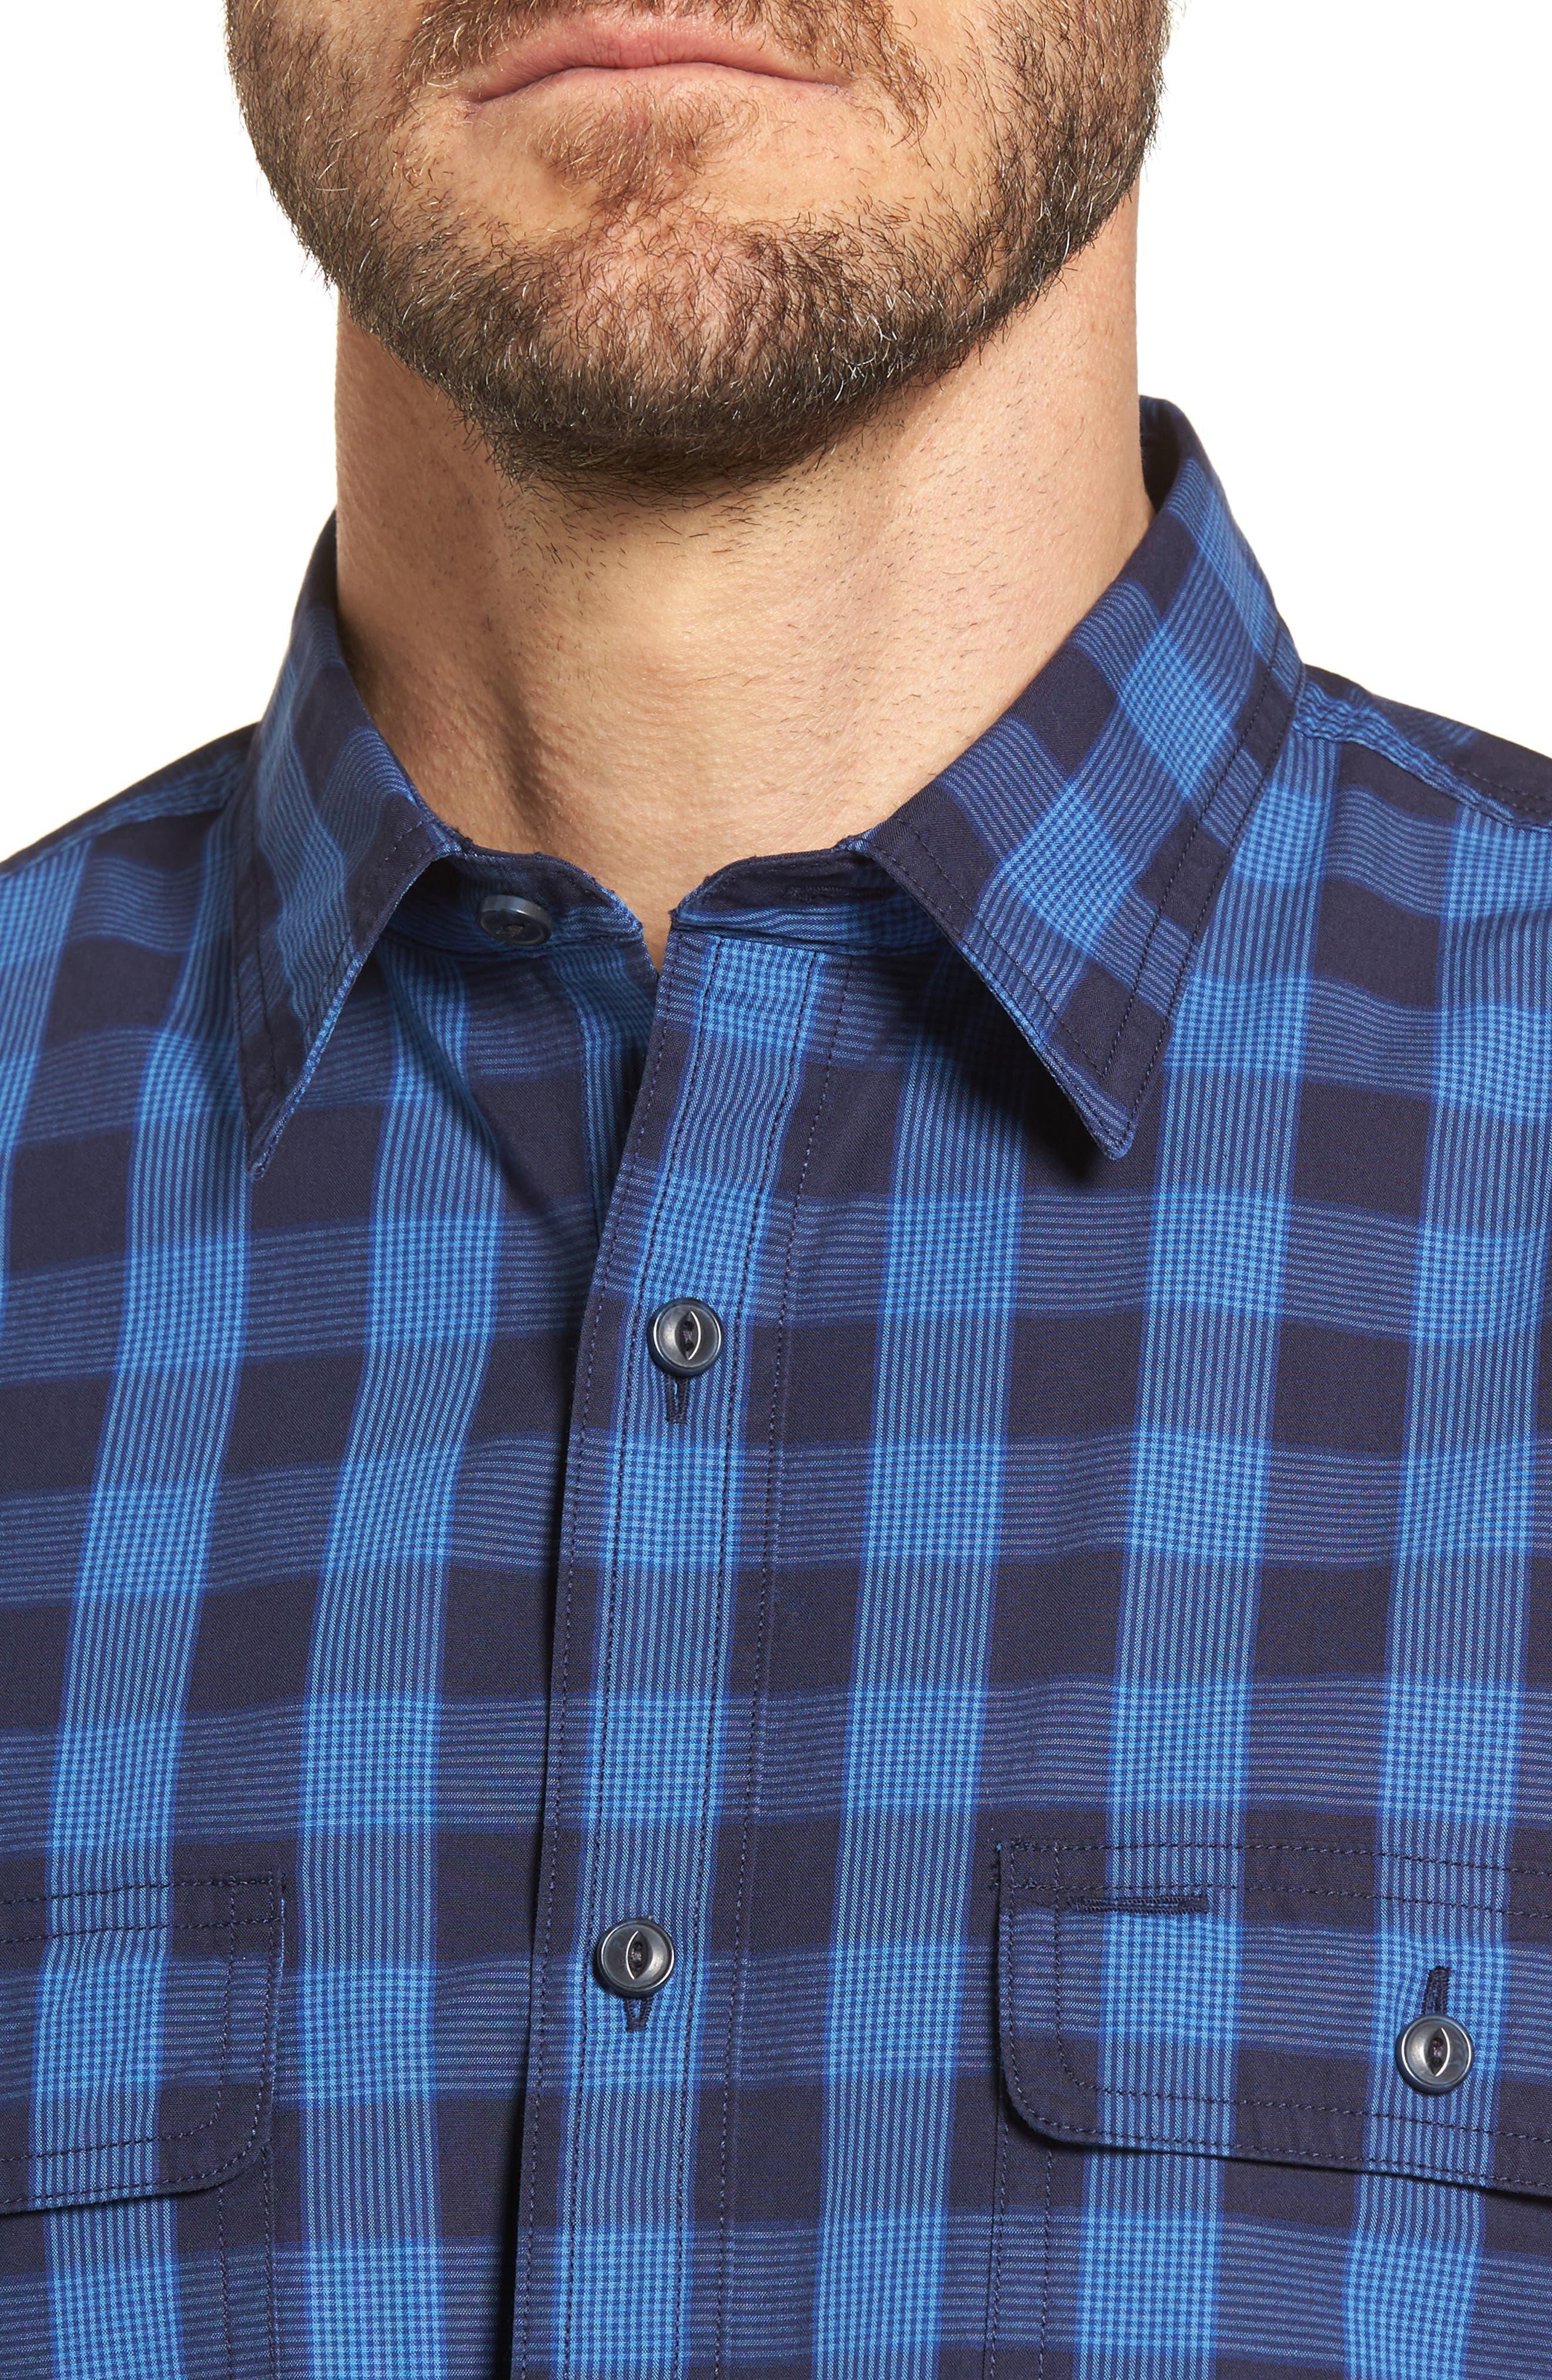 Trim Fit Plaid Trucker Sport Shirt,                             Alternate thumbnail 2, color,                             Navy Iris Blue Check